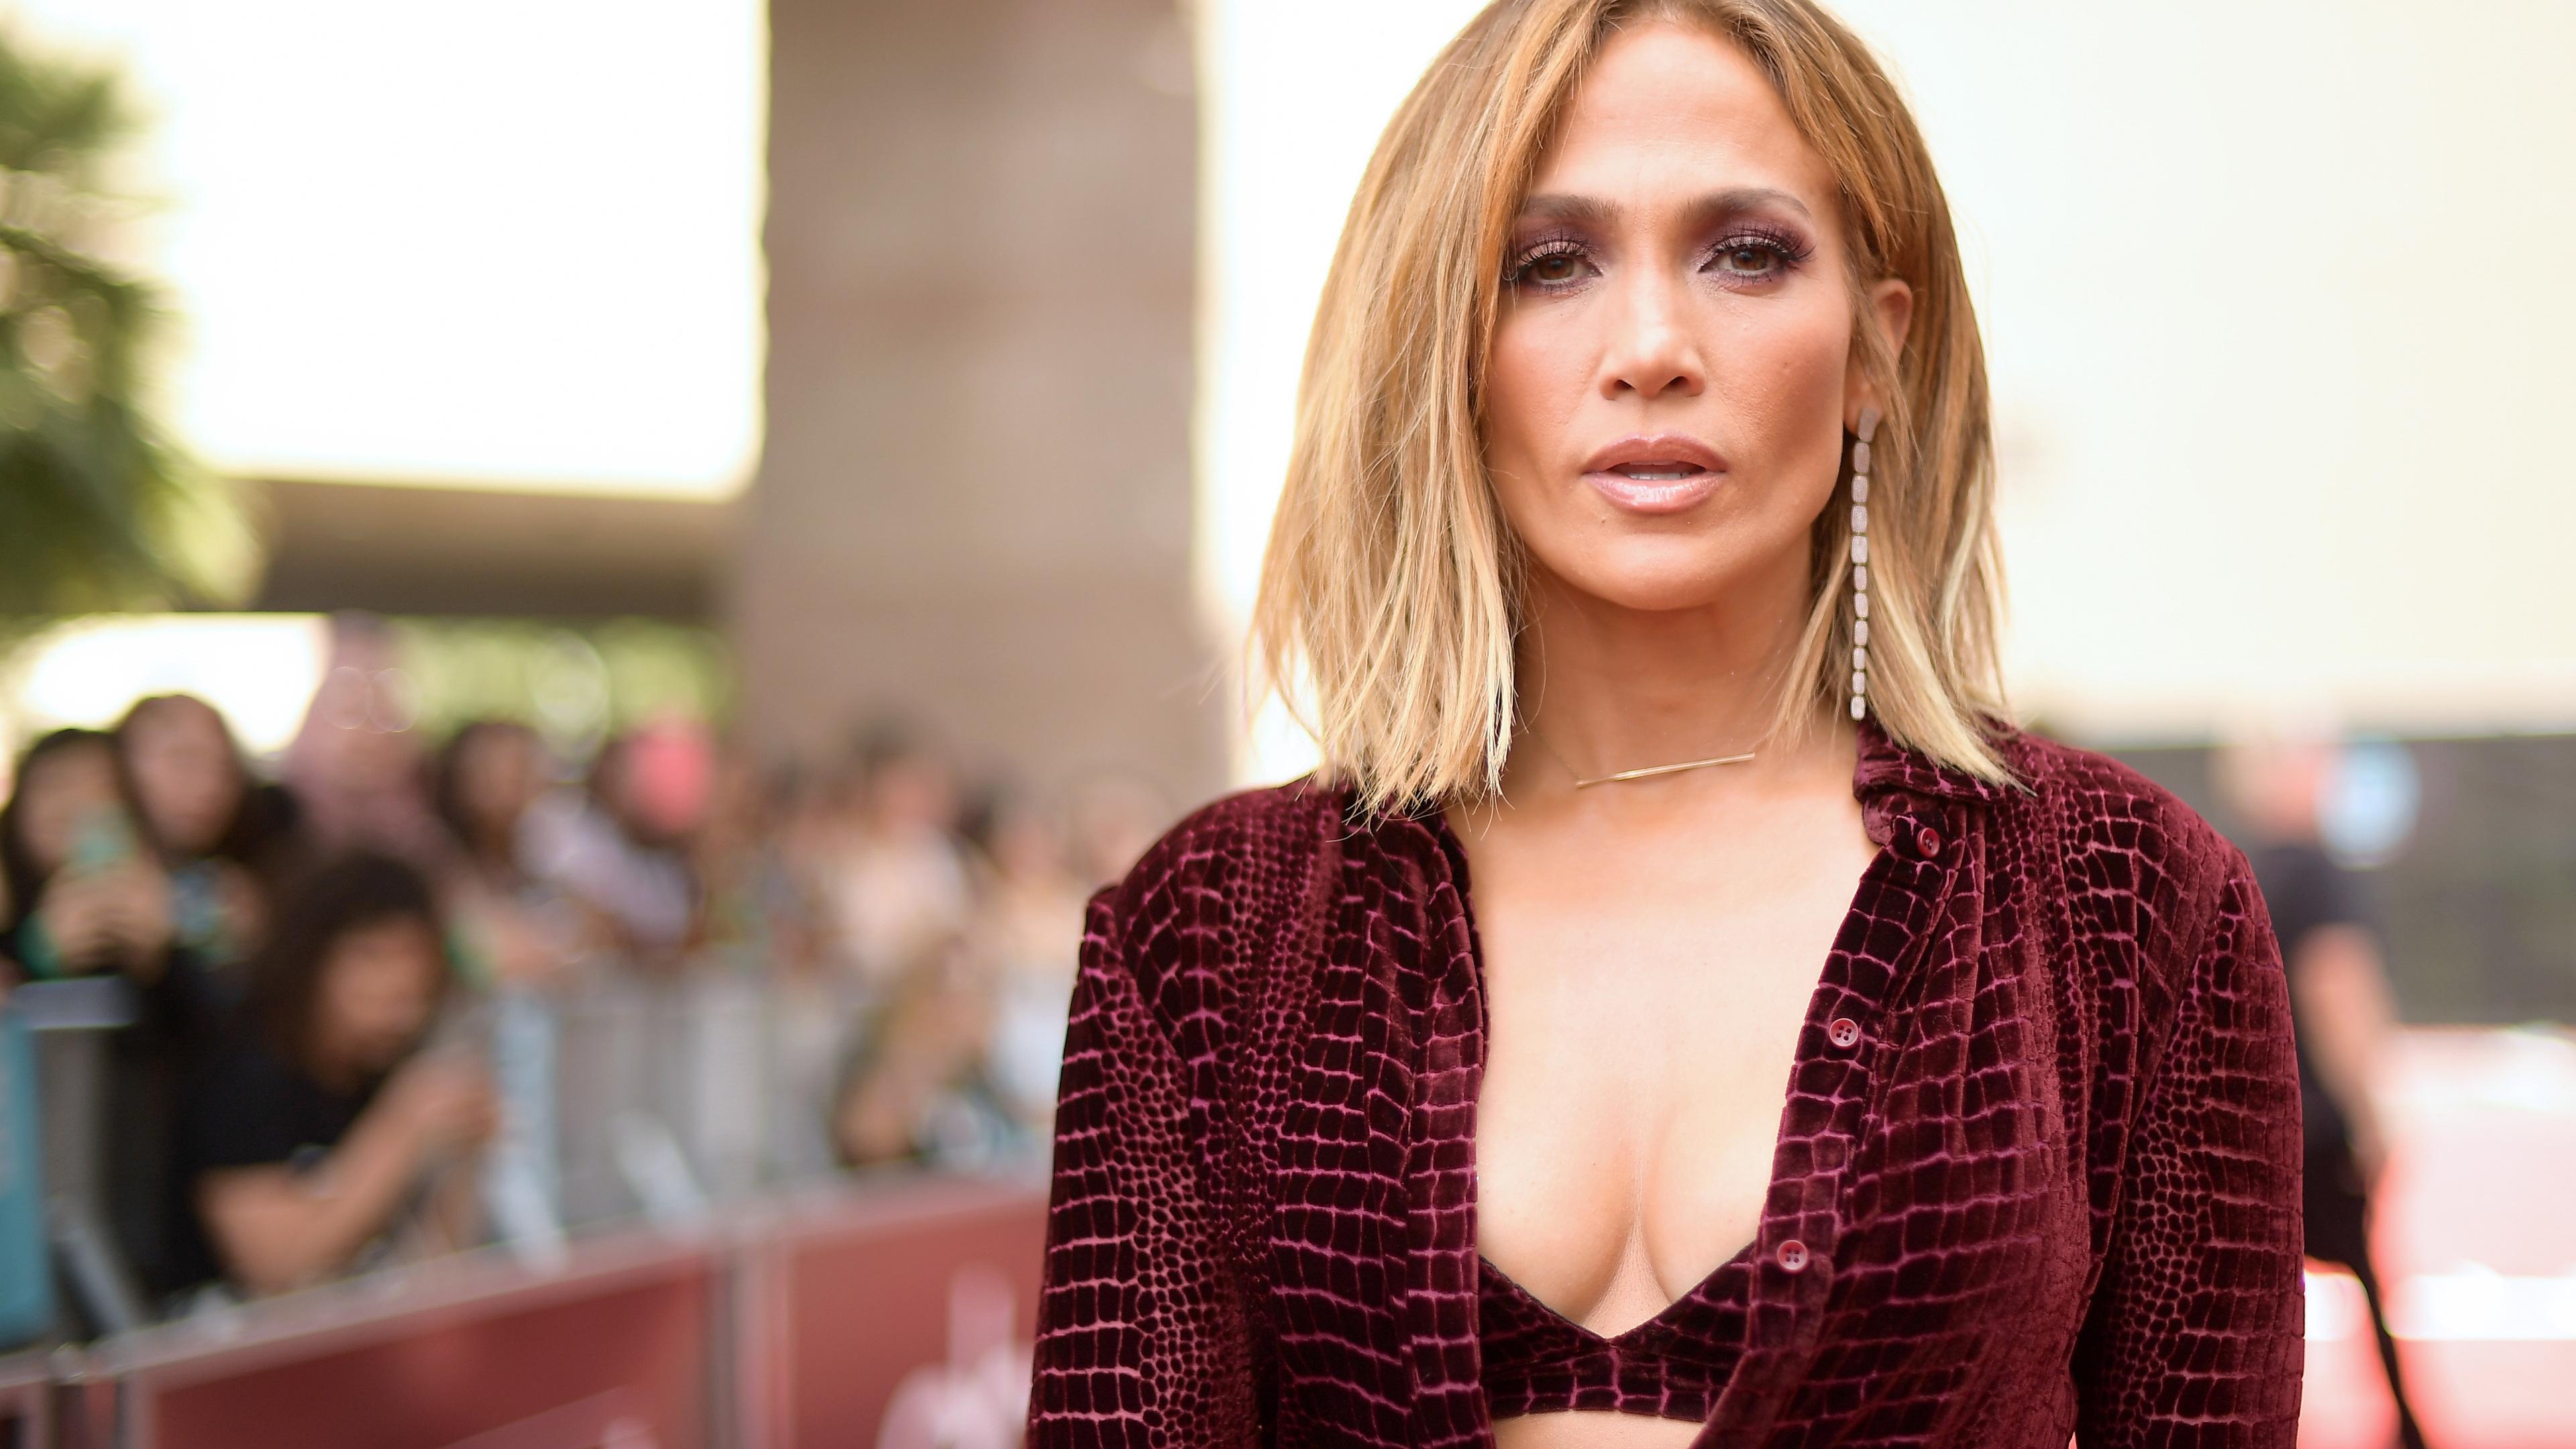 Wallpaper 4k Jennifer Lopez At Billboard Awards 4k